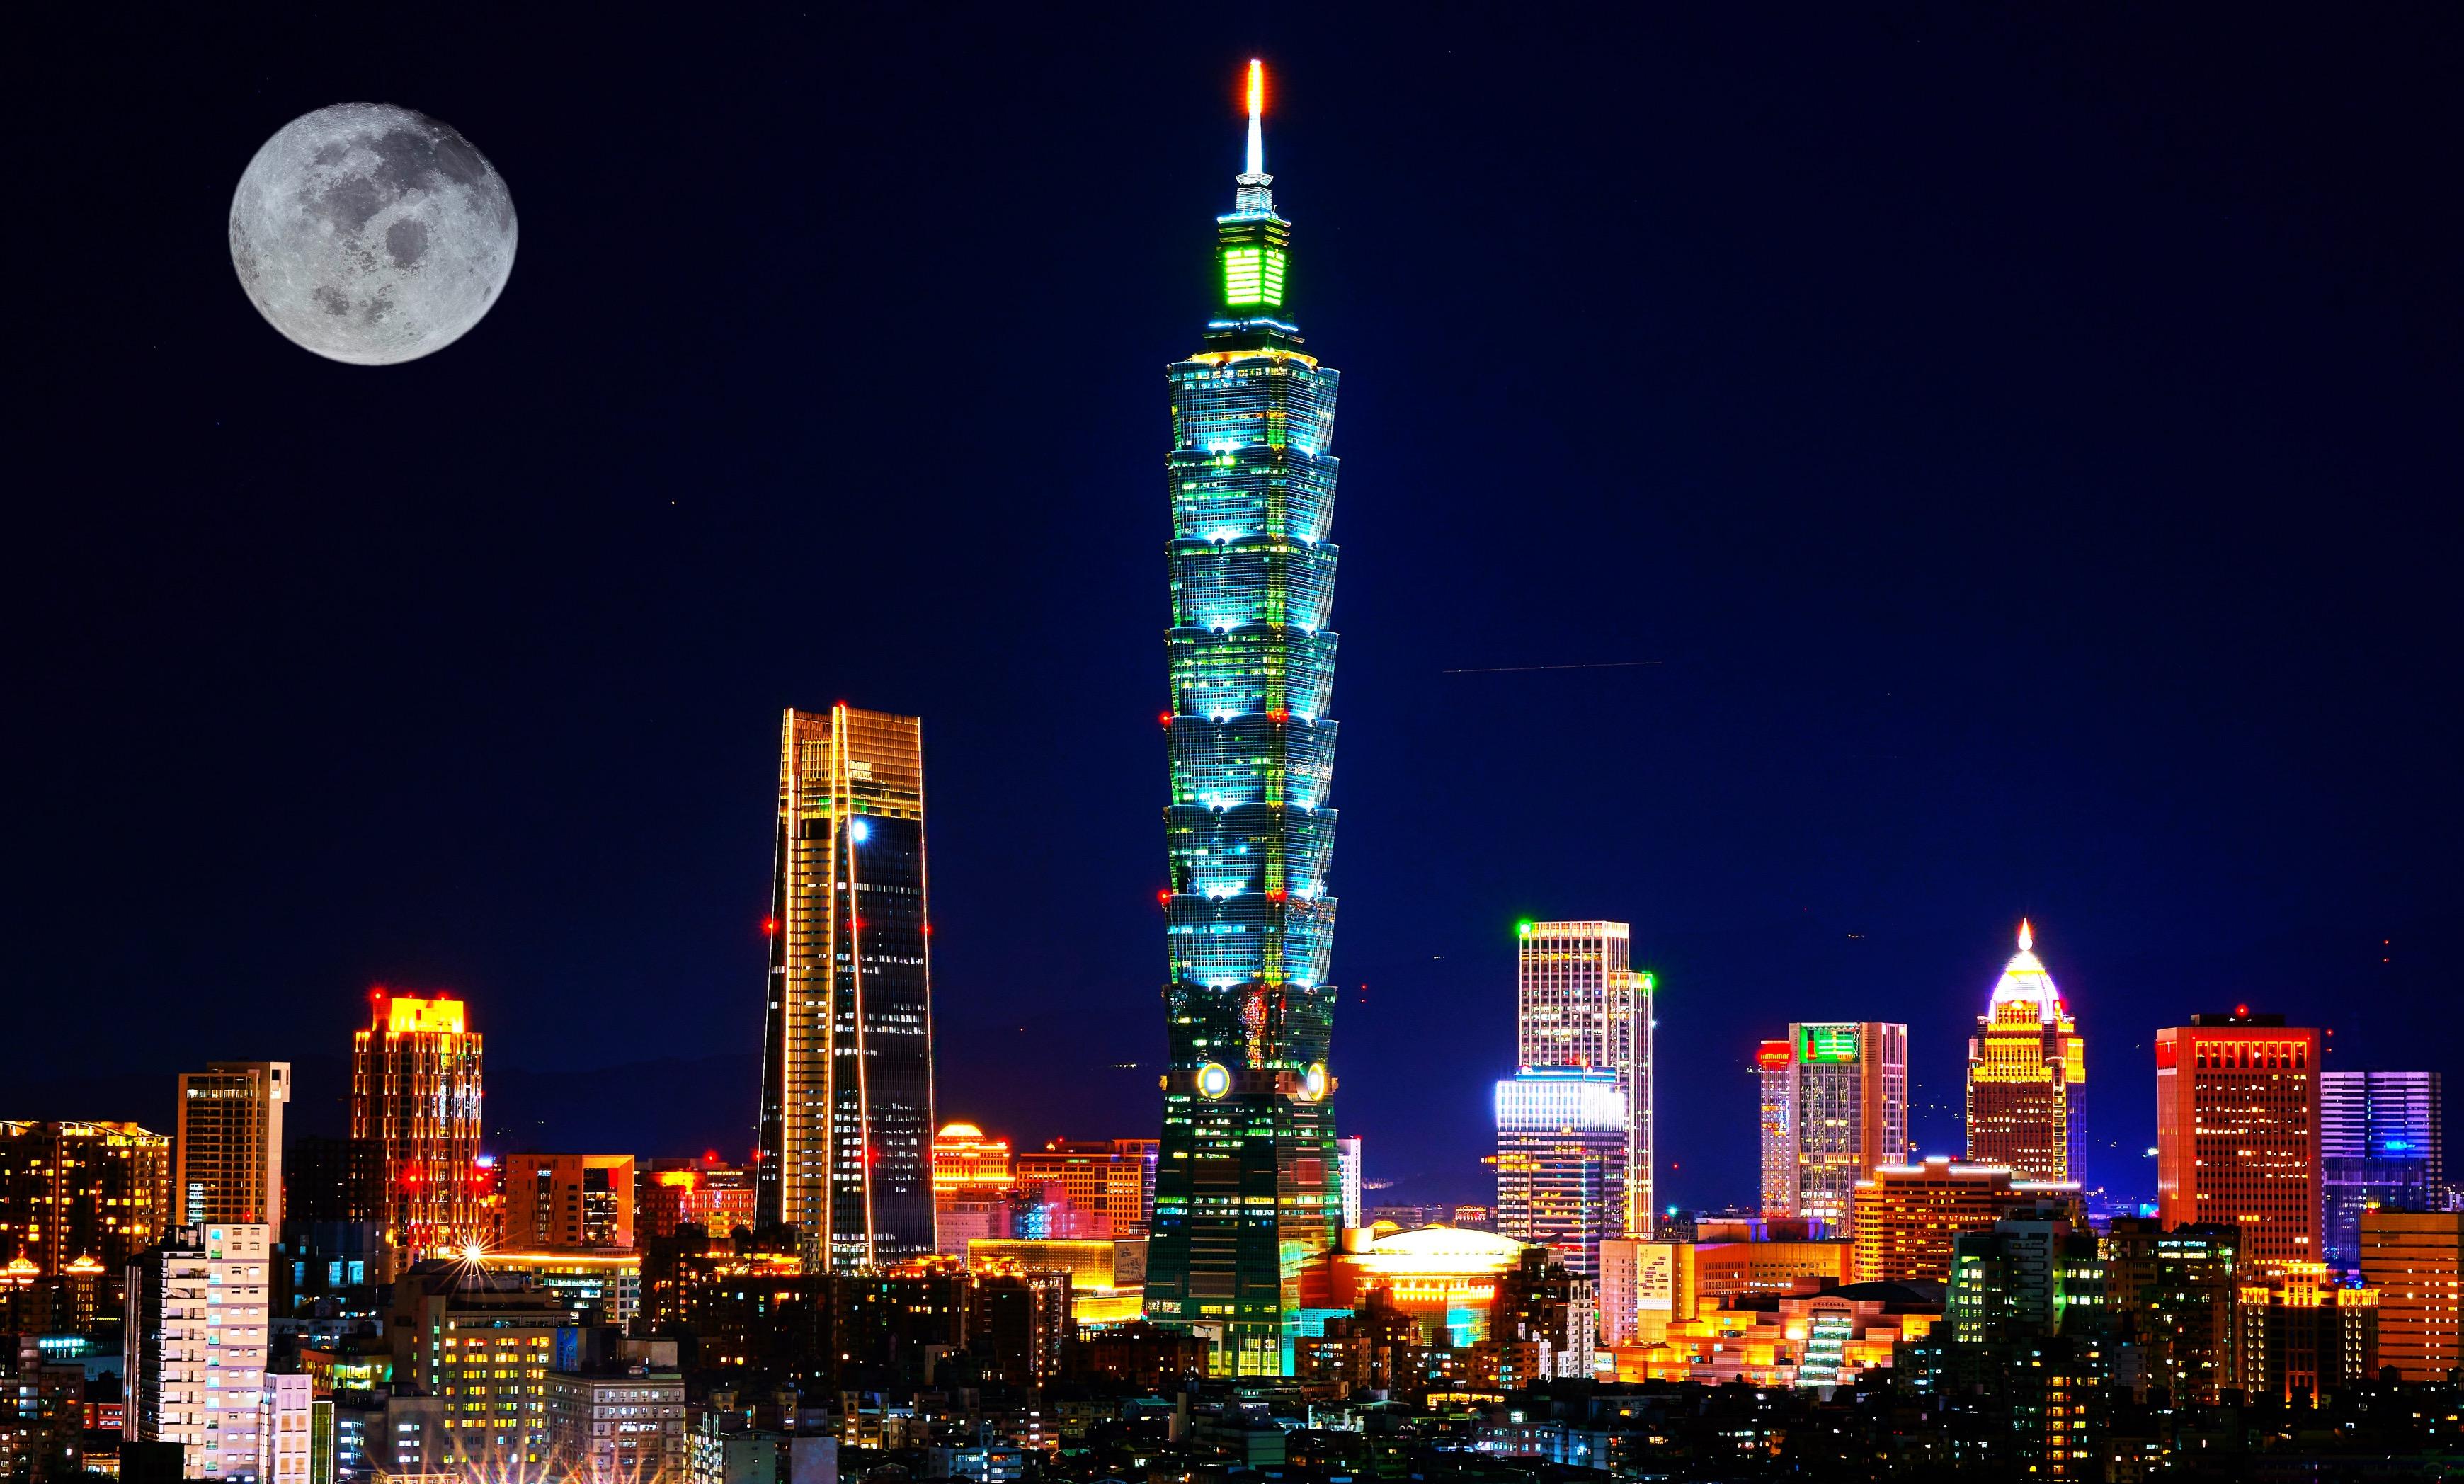 New York to Taipei Taiwan $492 RT Airfares on Air China (Travel February - April 2020)